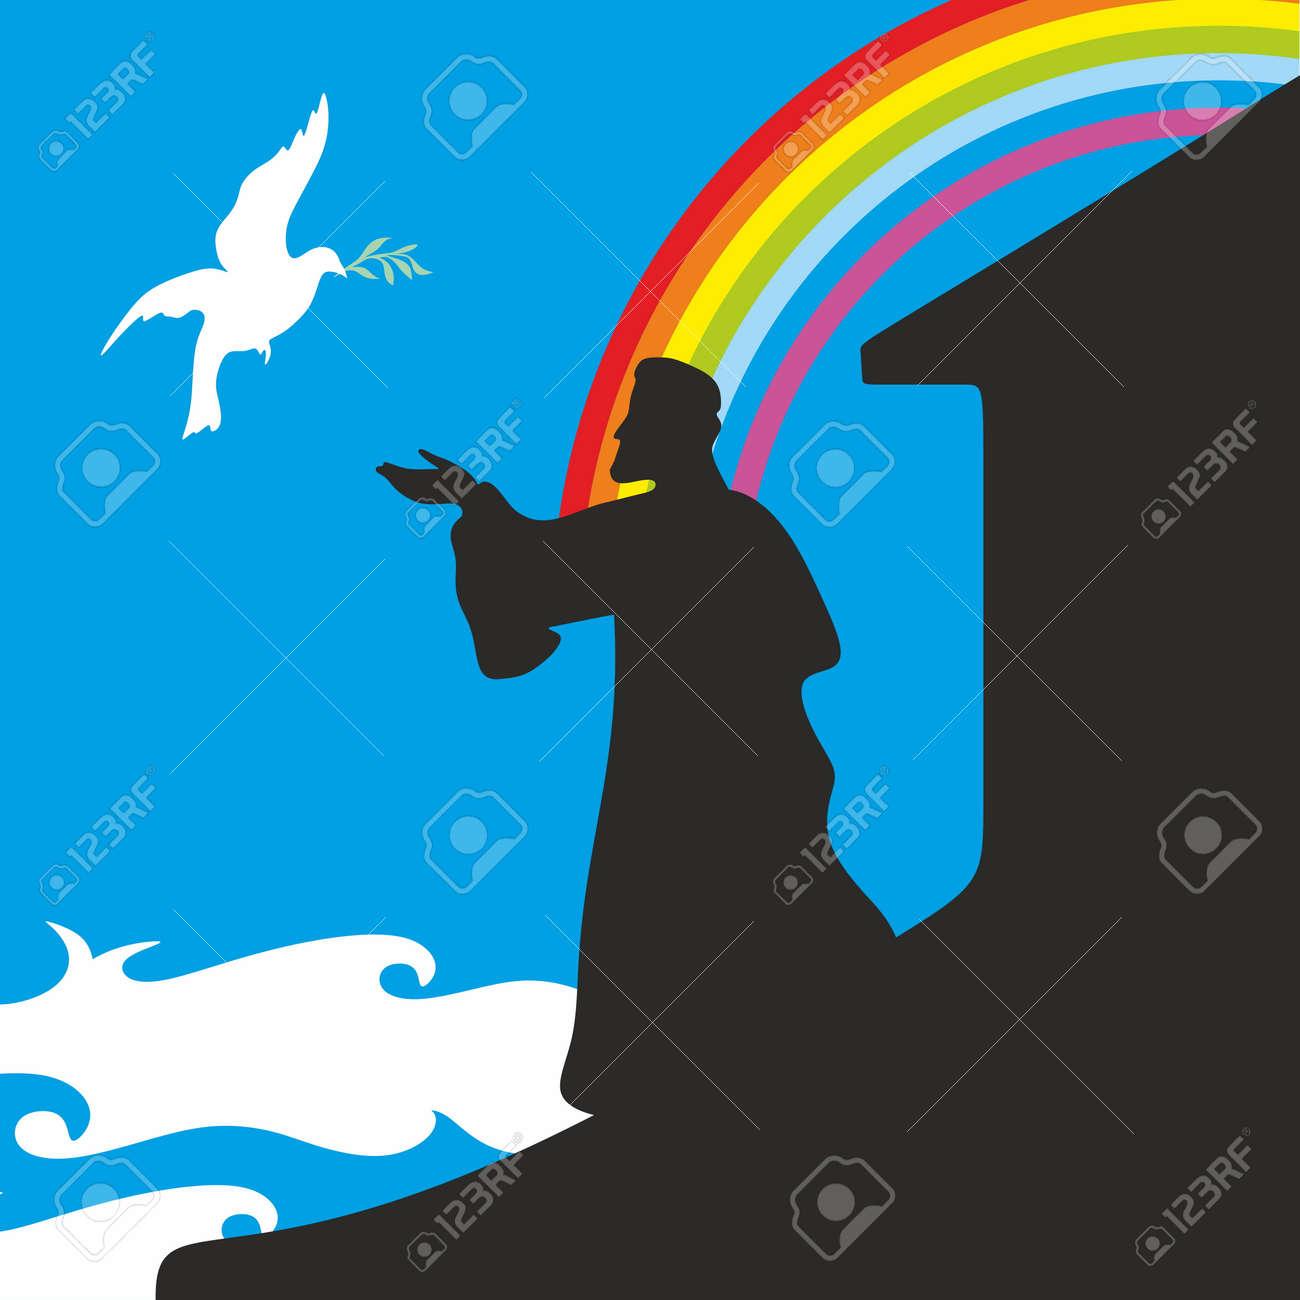 Noahs Ark And Rainbow Silhouette Hand Drawn Stock Vector